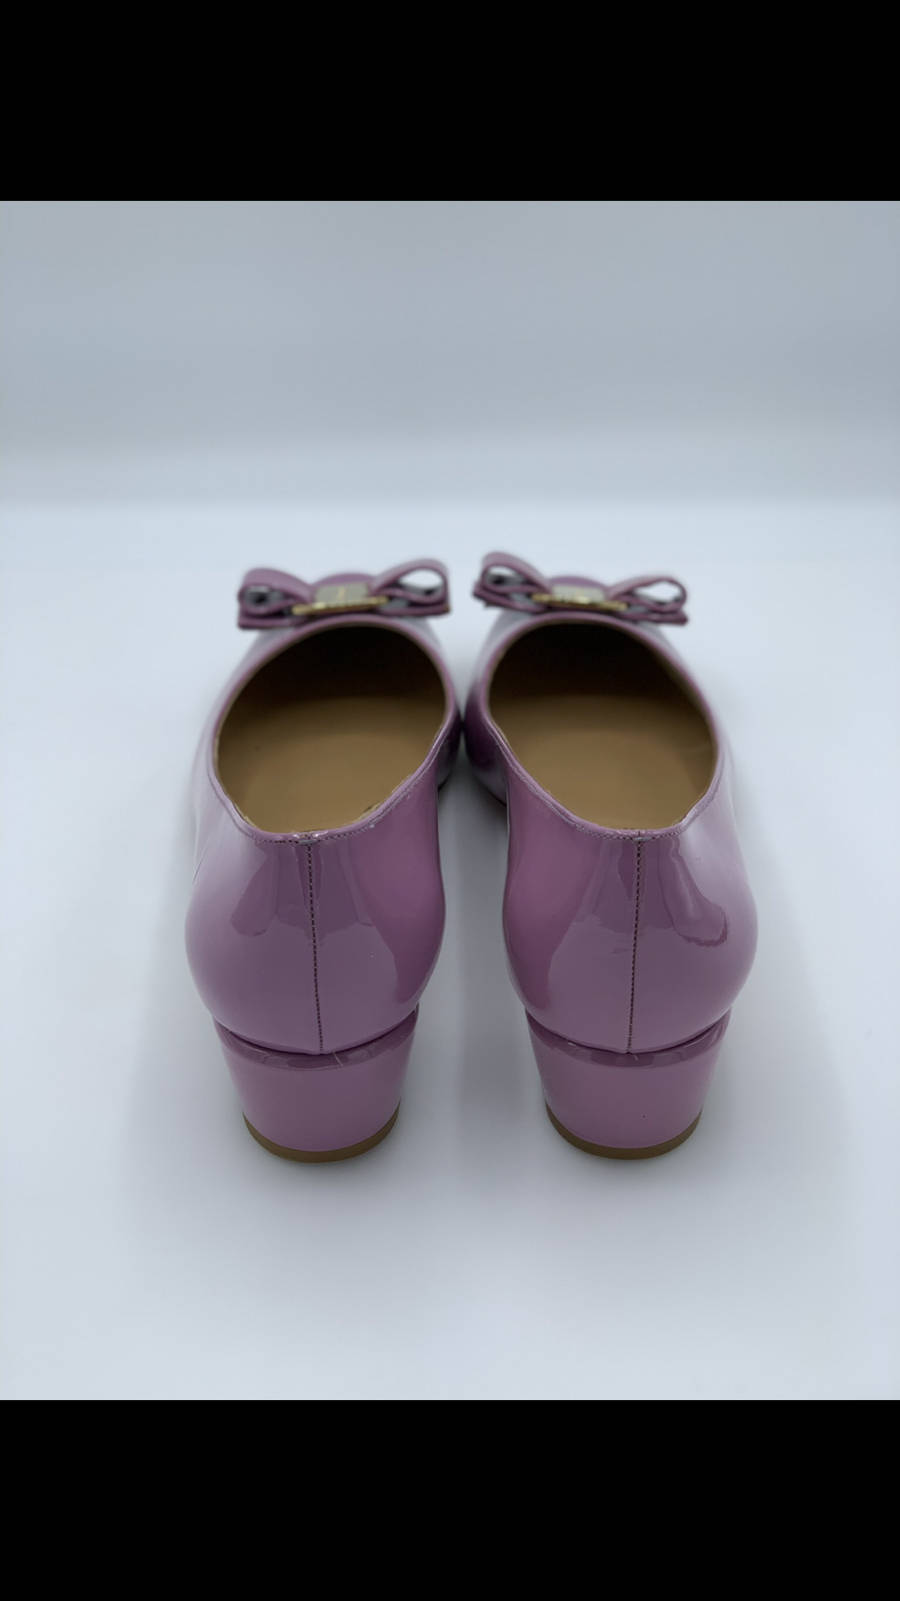 Salvatore-Ferragamo-Shoe-10-Pump-Patent-Leather-Bow-Lavender-New-Gold-Hardware_12611C.jpg